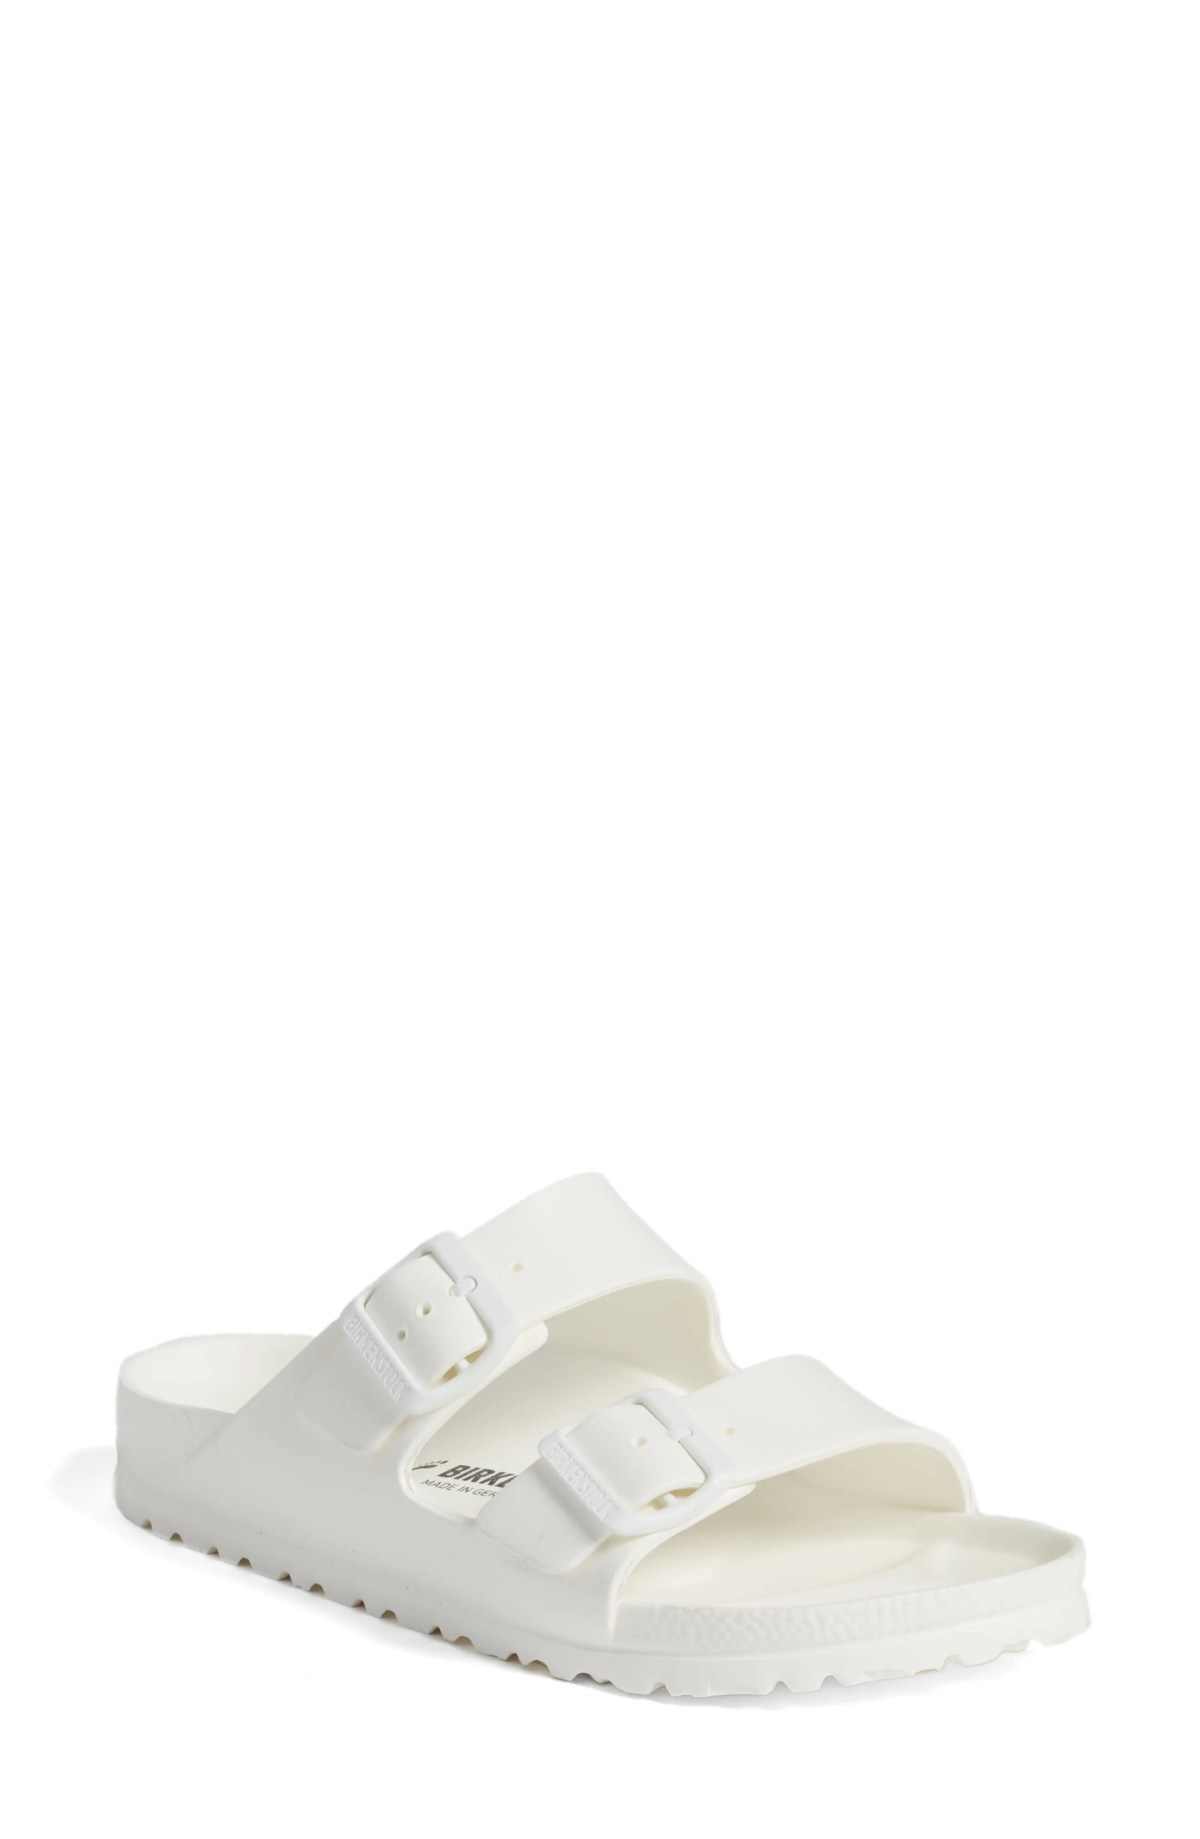 BIRKENSTOCK Essentials - Arizona Slide Sandal, Main, color, WHITE EVA